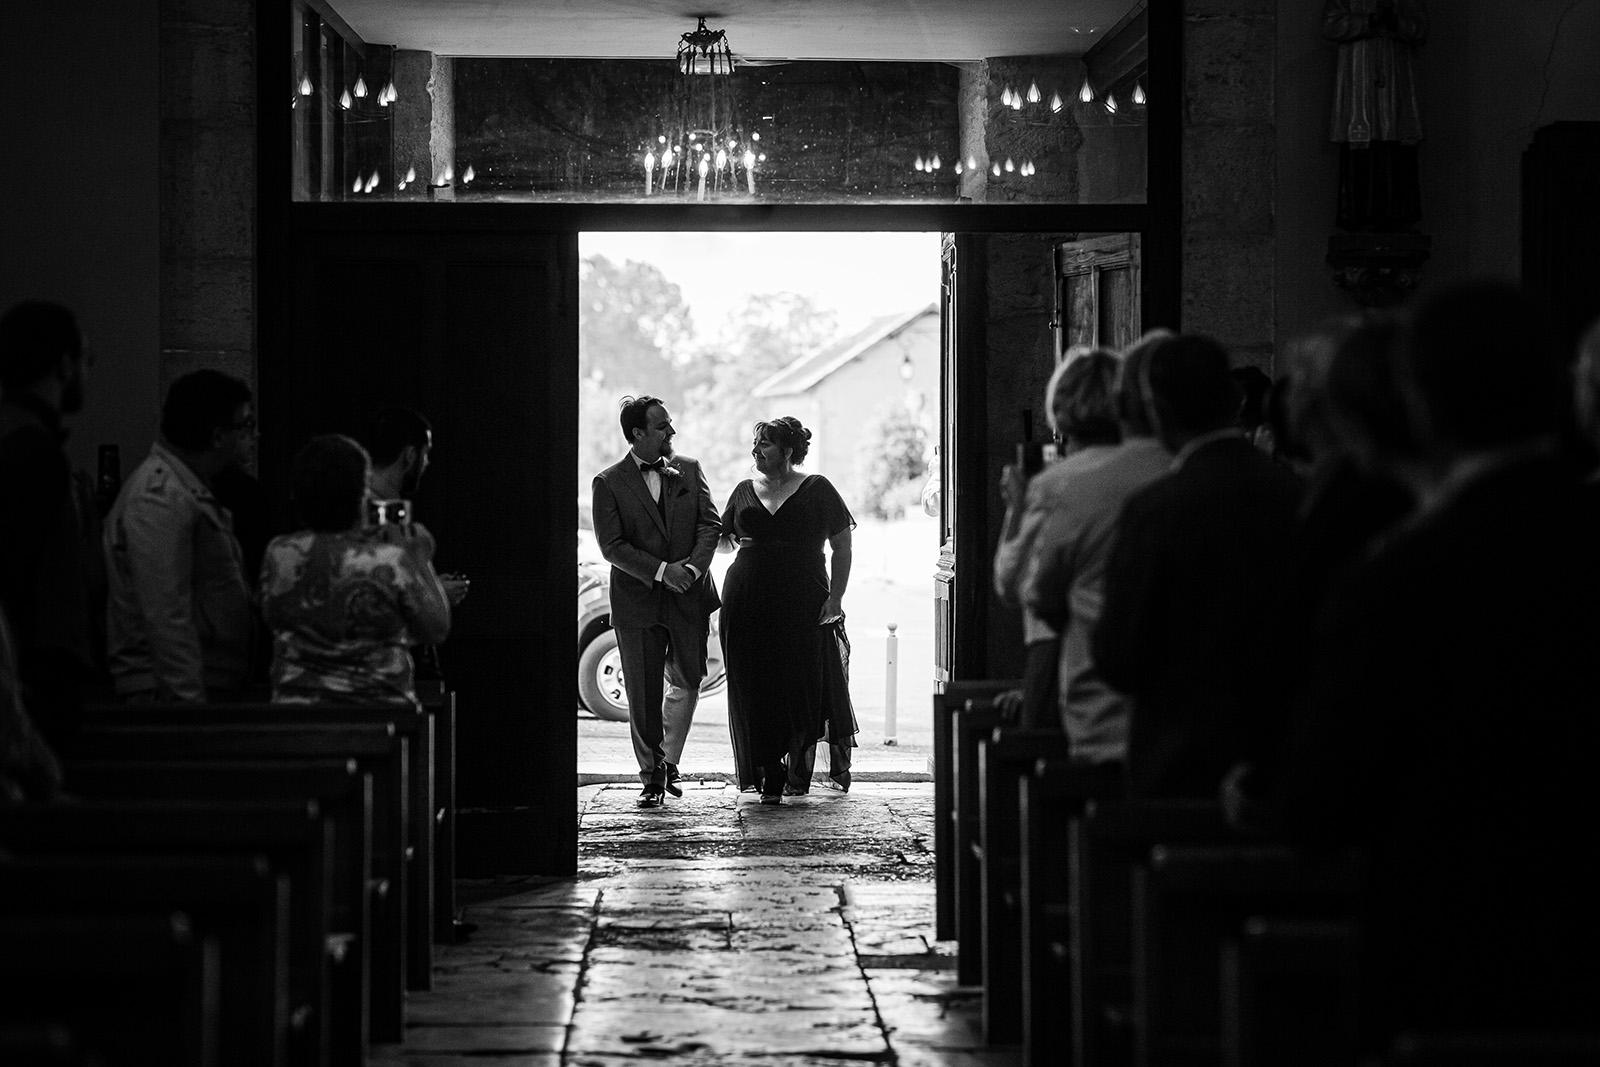 photographe-mariage-wedding-photographer-reportage-photo-domaine-des-plagnes-couple-elise-julliard-auvergne-rhone-alpes-bourgoin-jallieu-ceremonie-religieuse